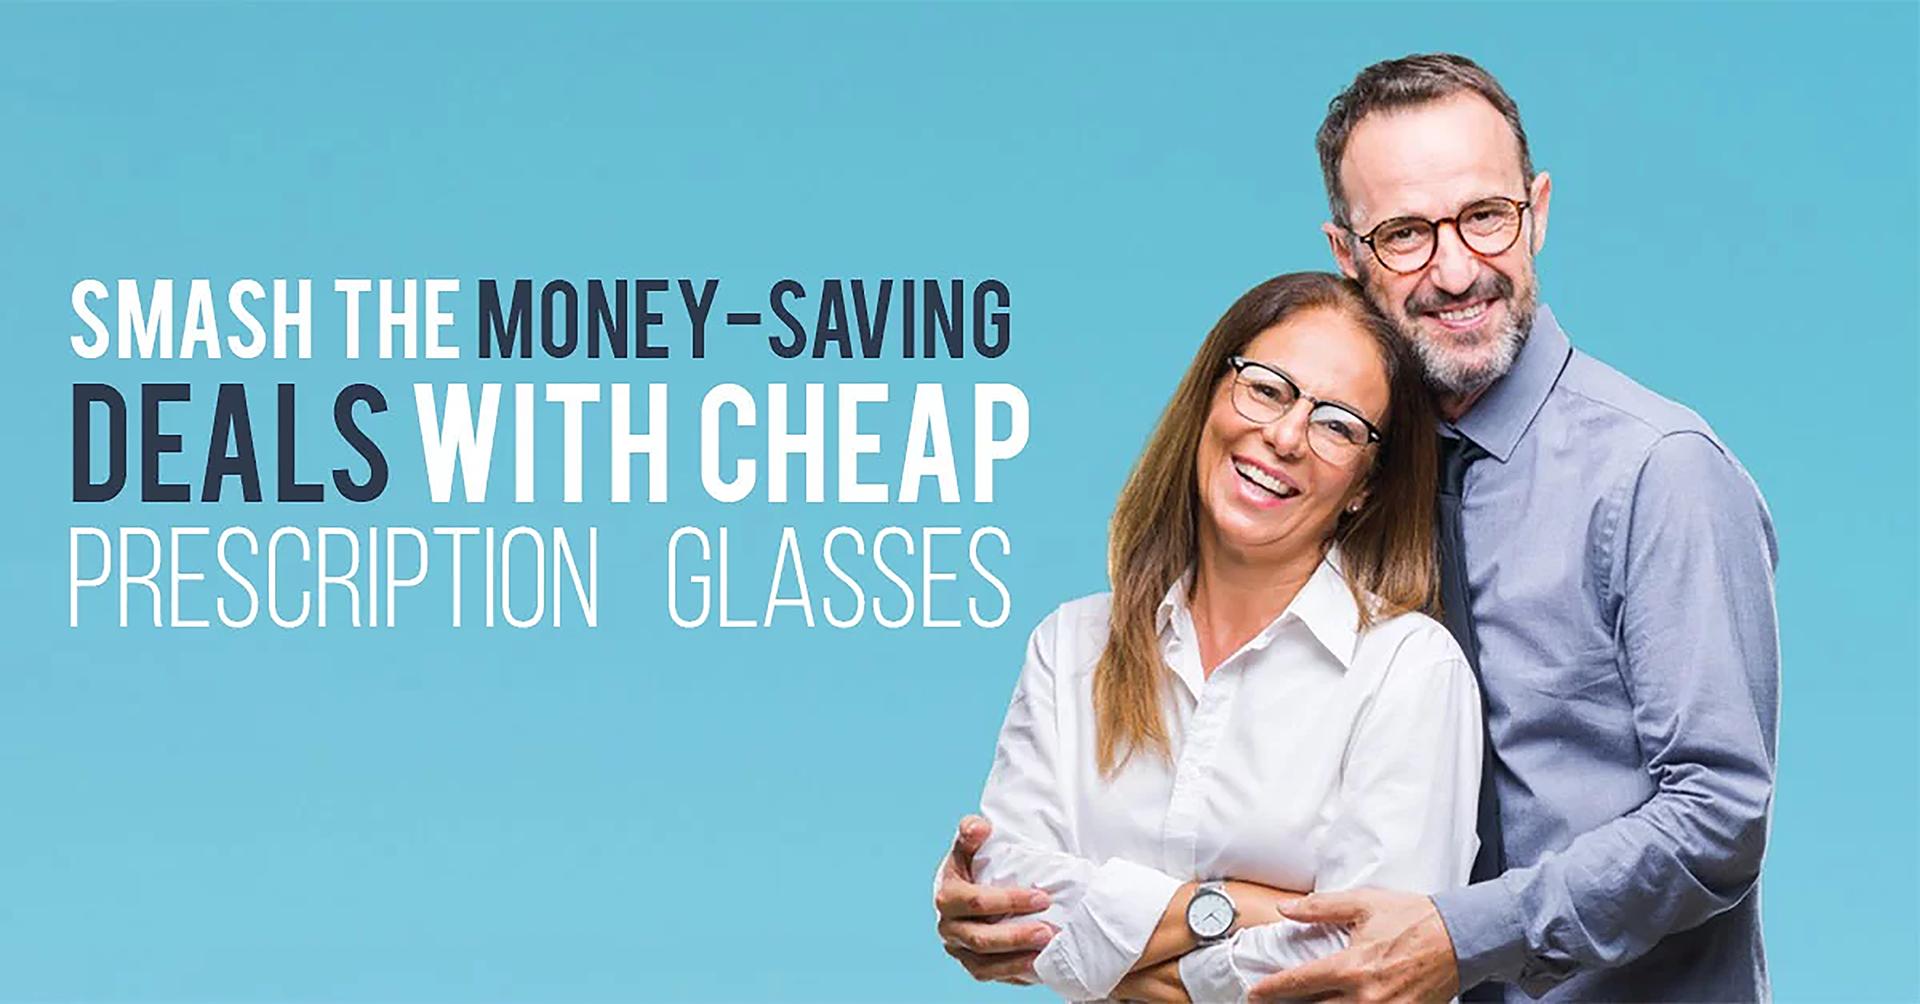 14) SMASH THE MONEY-SAVING DEALS WITH CHEAP PRESCRIPTION GLASSES